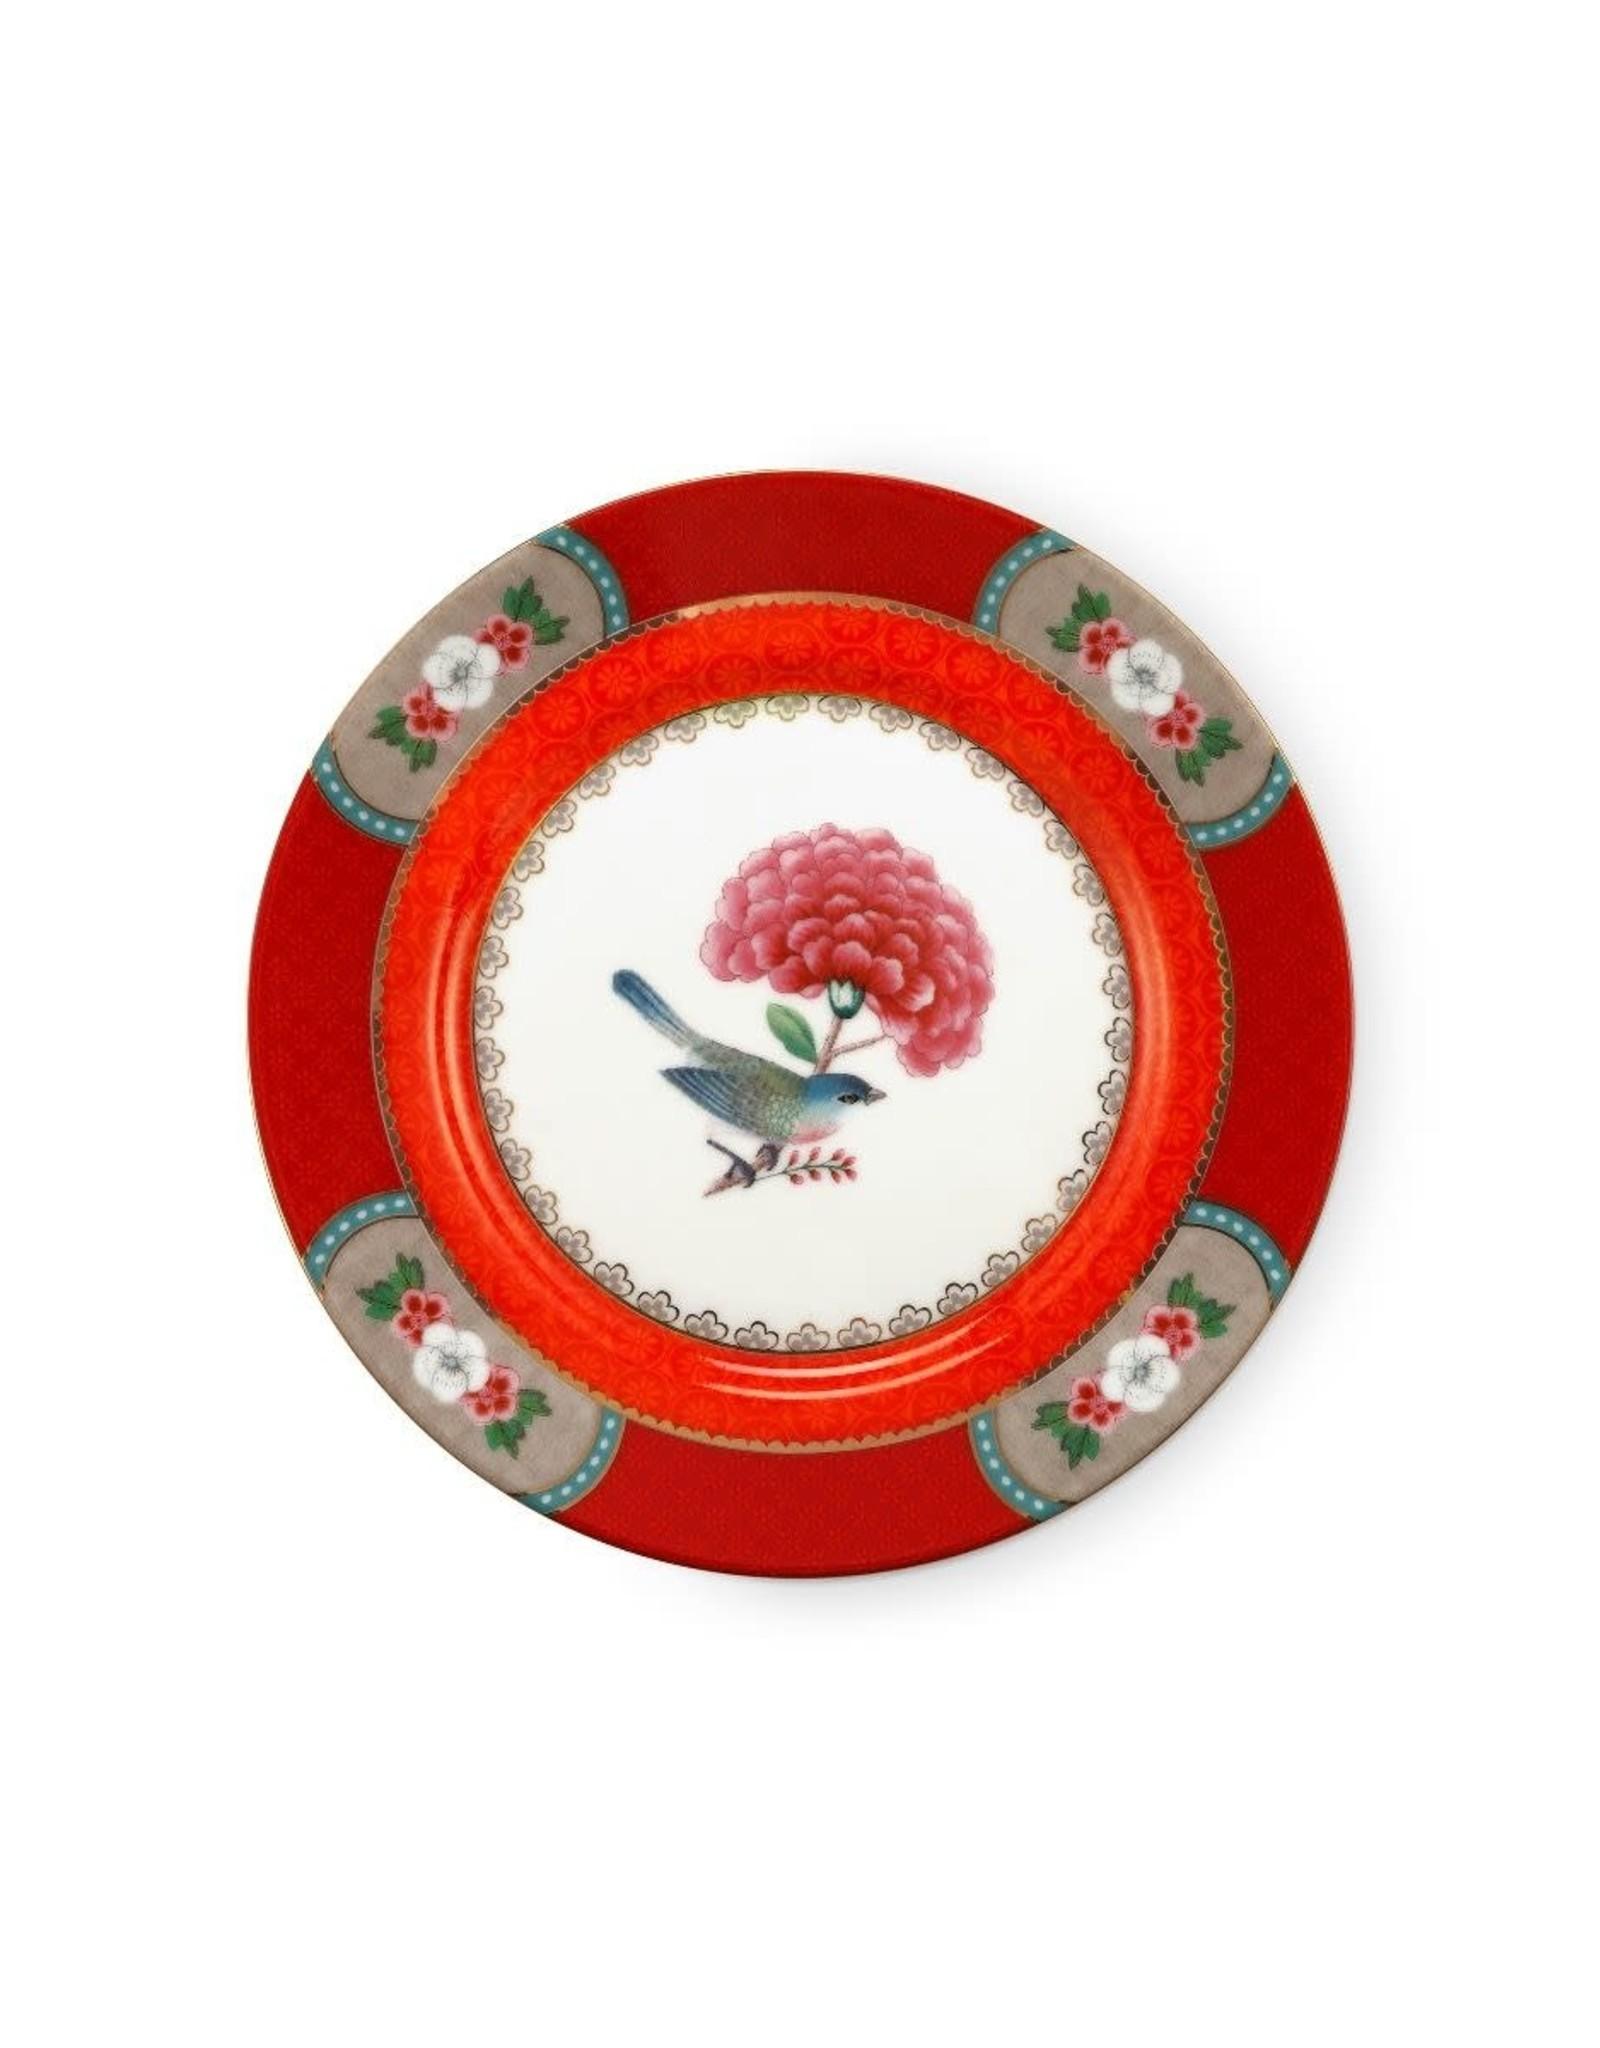 pip-studio Pip Studio. Plate Blushing Birds Red 17cm